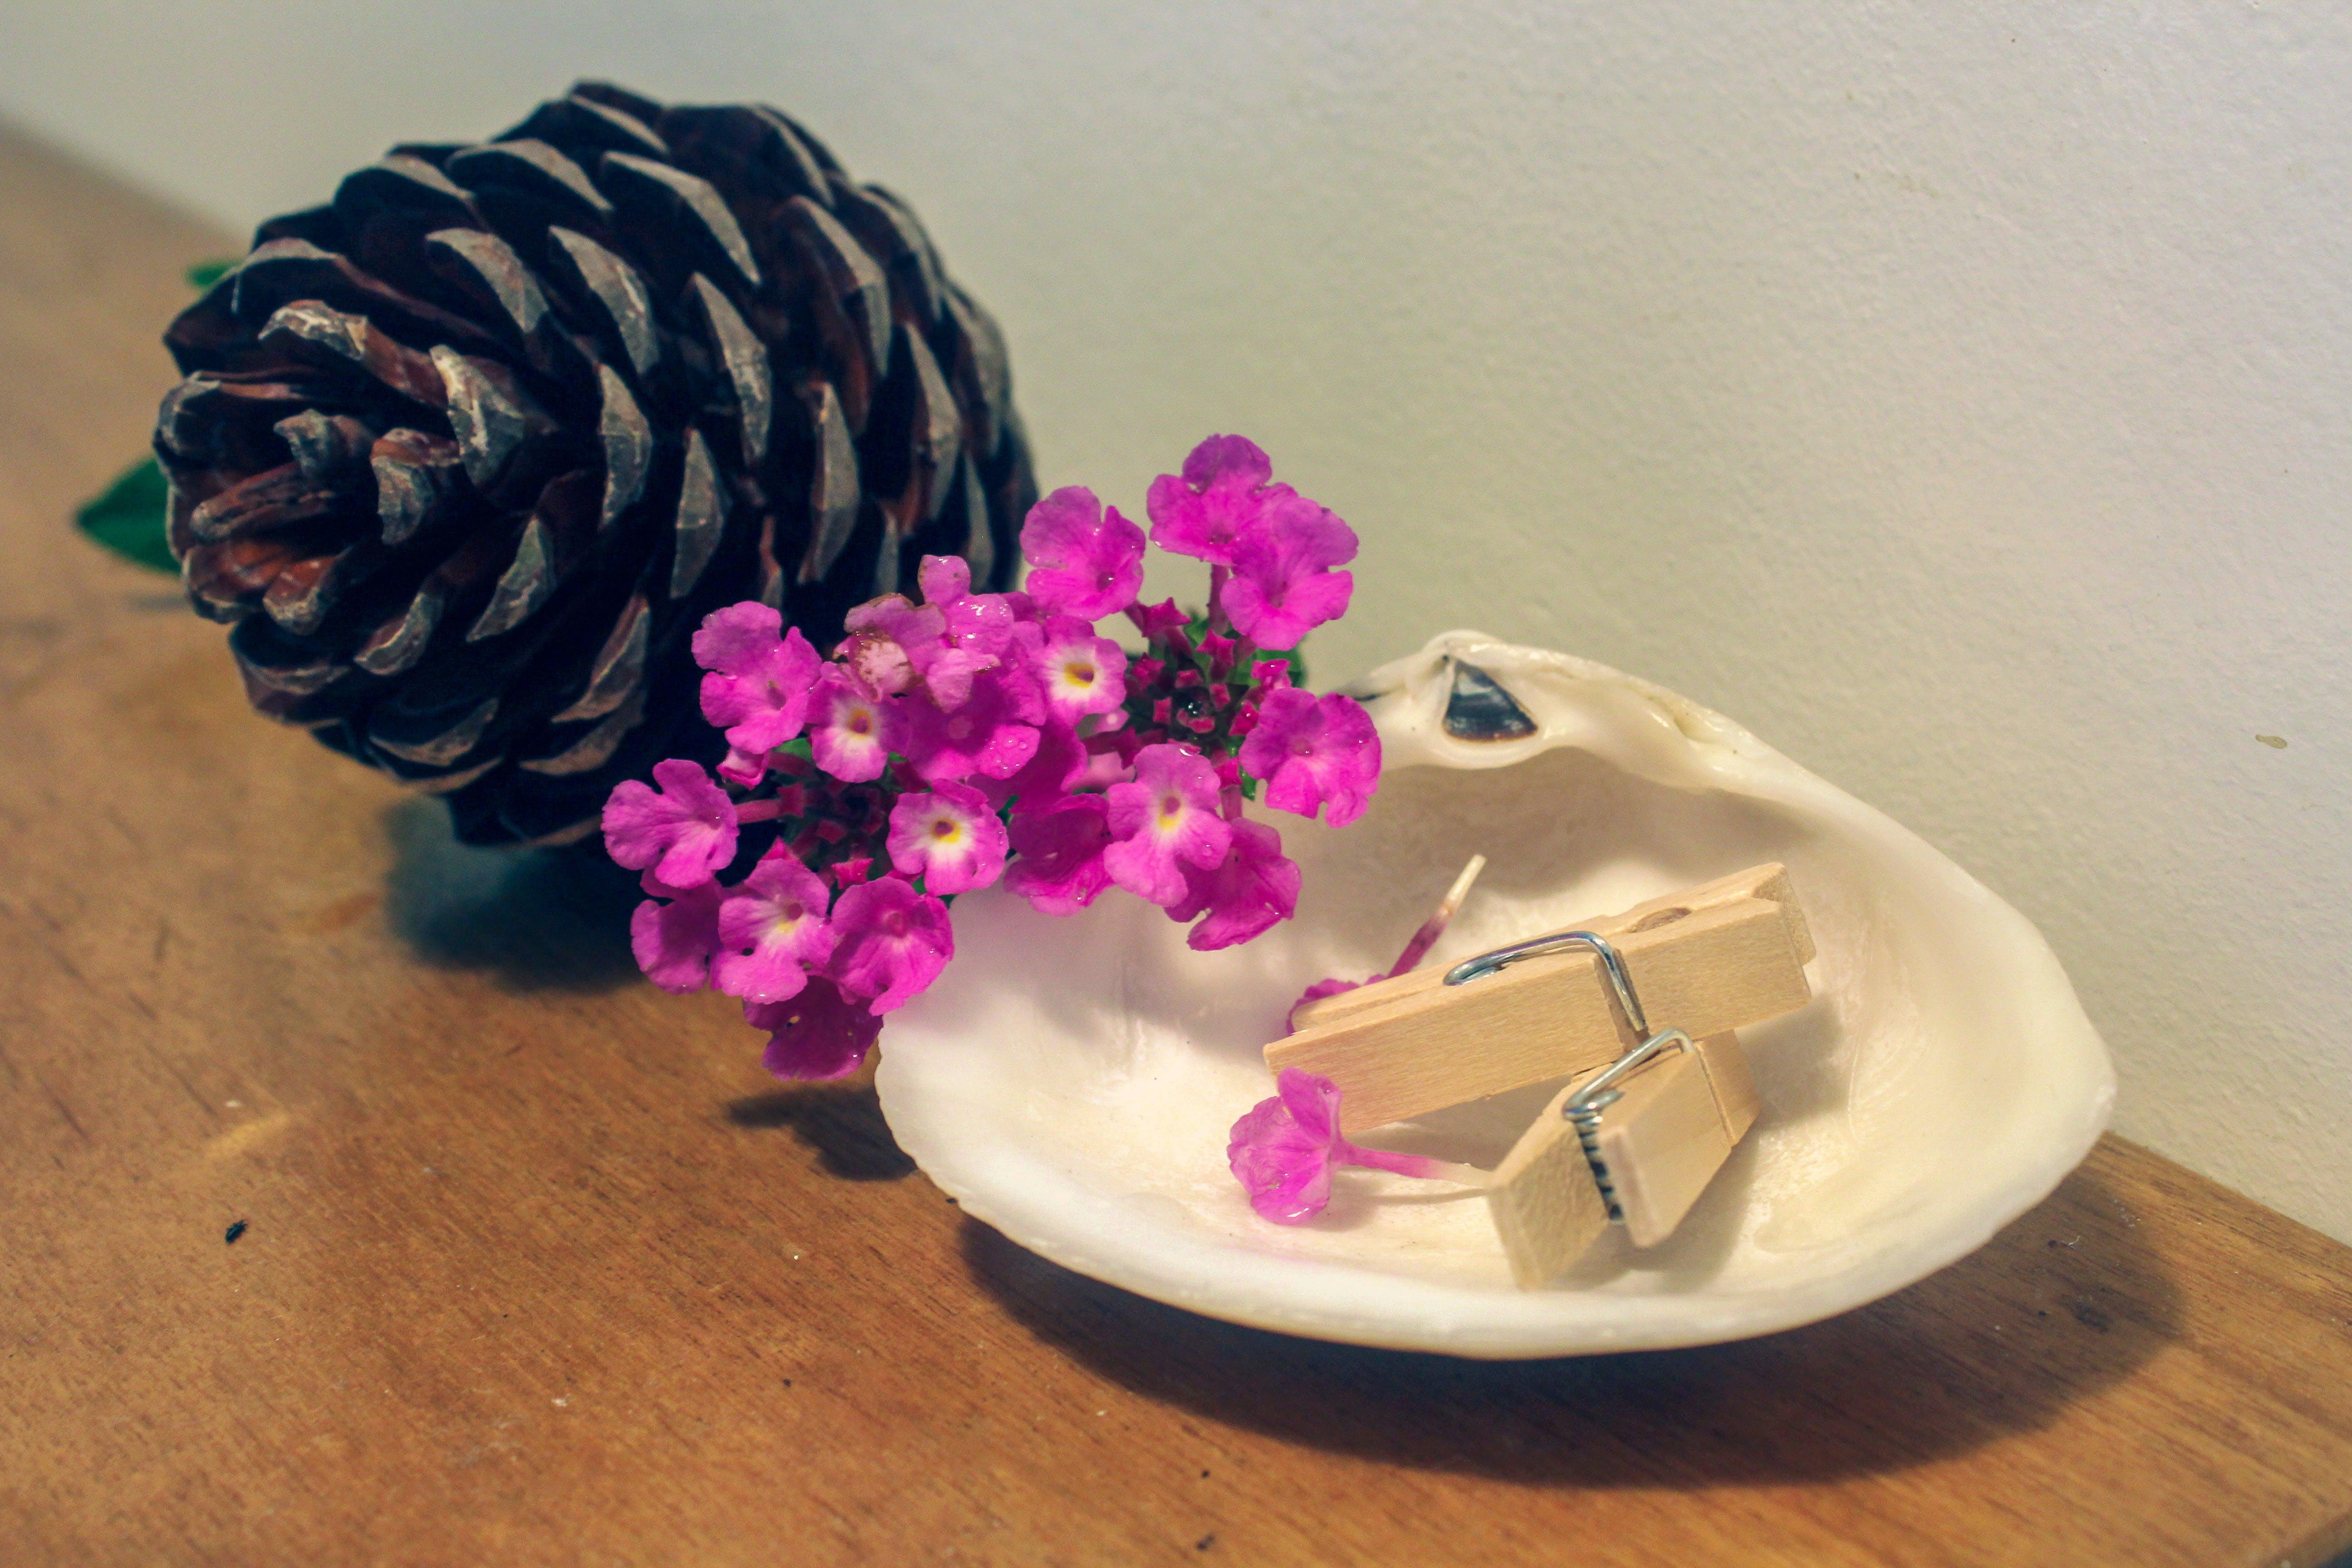 Free stock photo of pegs, pinecone, wild flowers